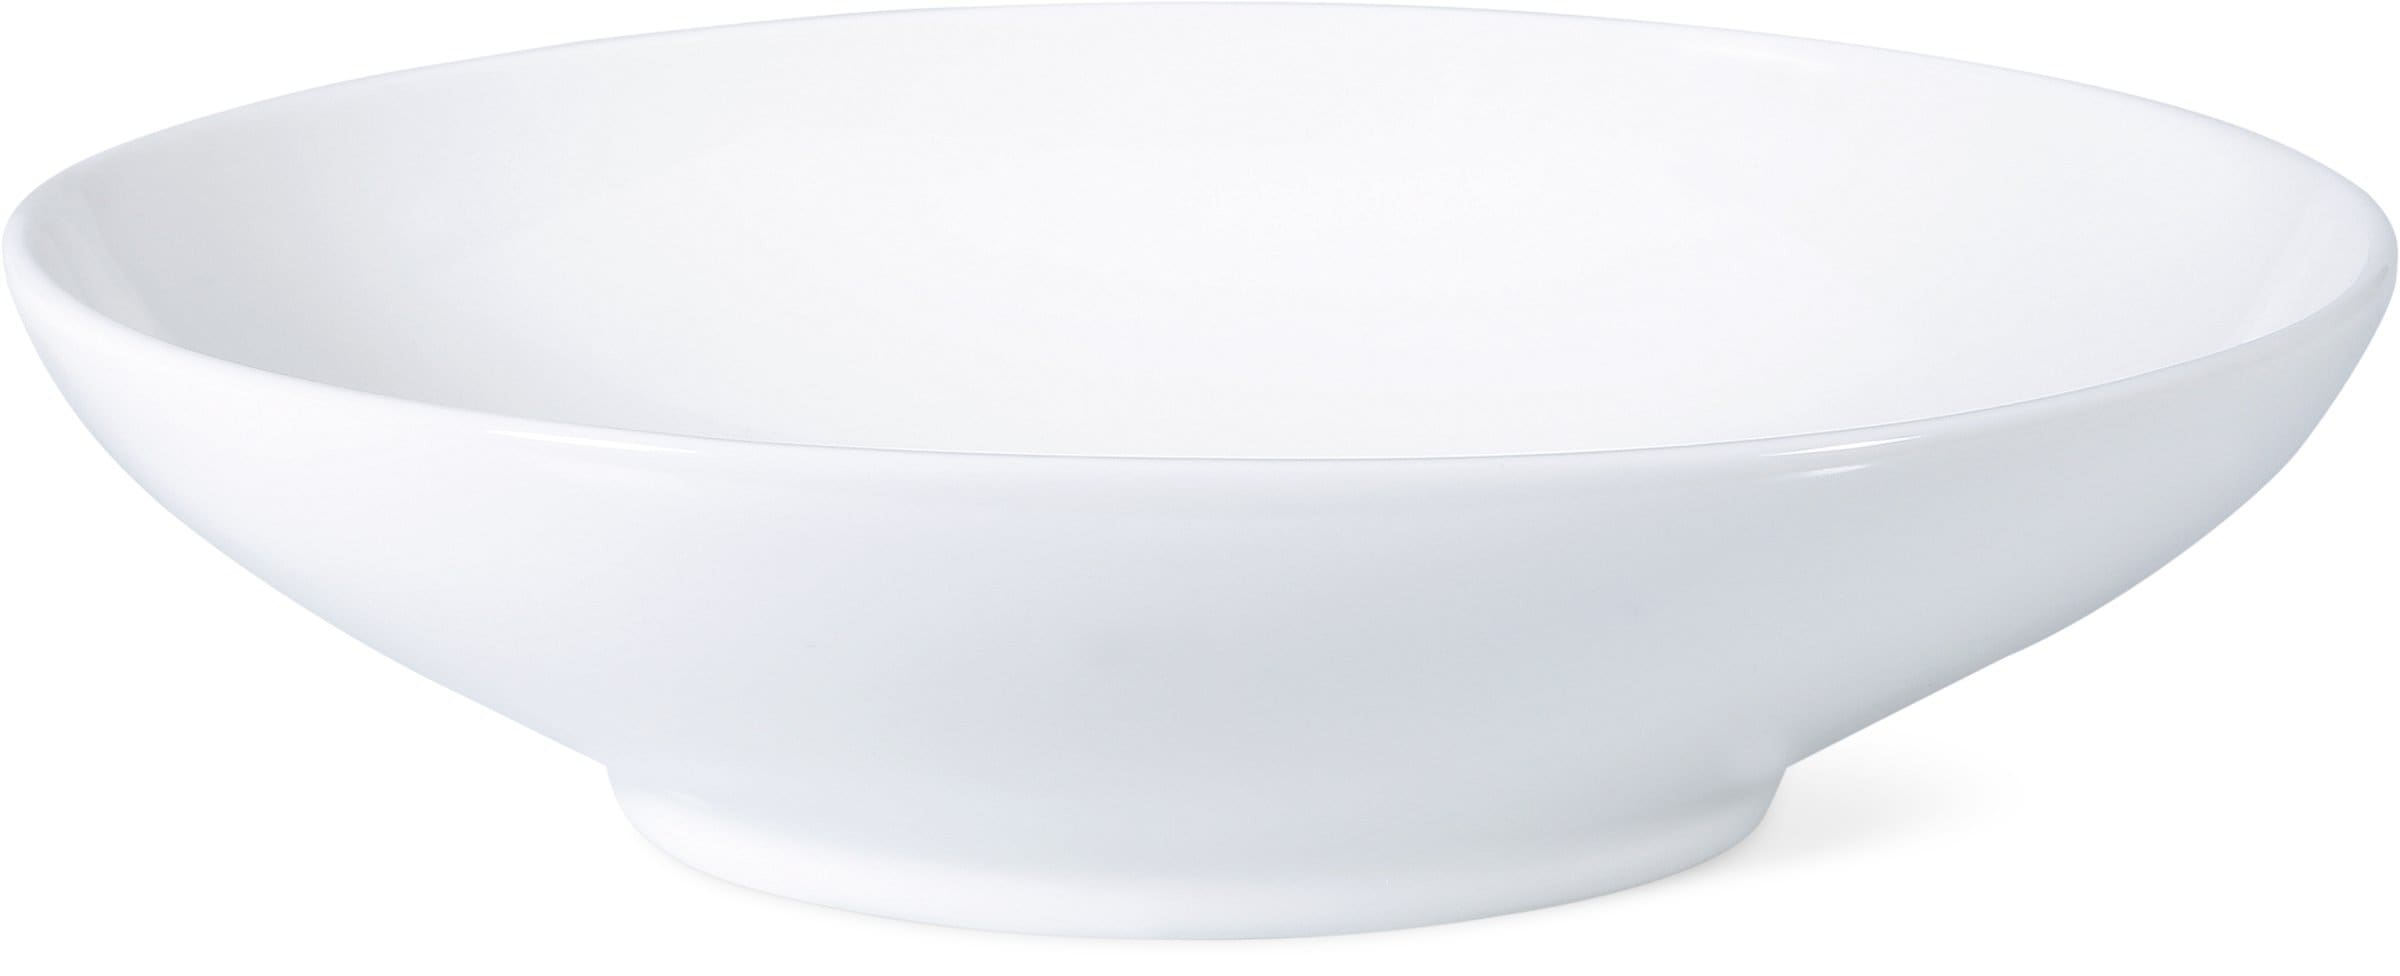 Cucina & Tavola PURE Bol 21x16.5cm